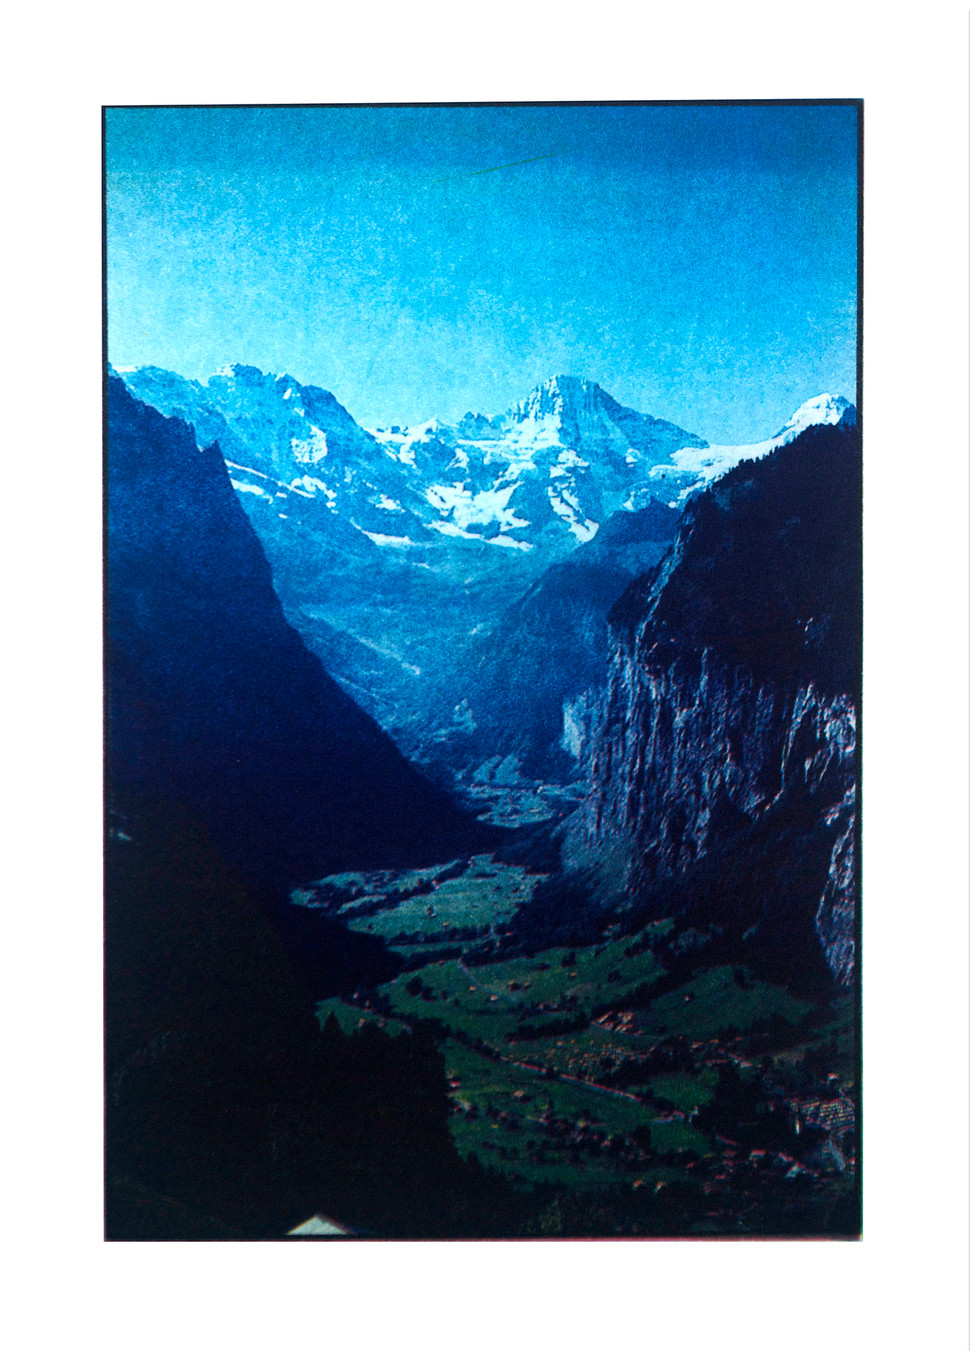 Jane Sampson 'Lauterbrunnen' Photo etching  15 x 21cm A/P